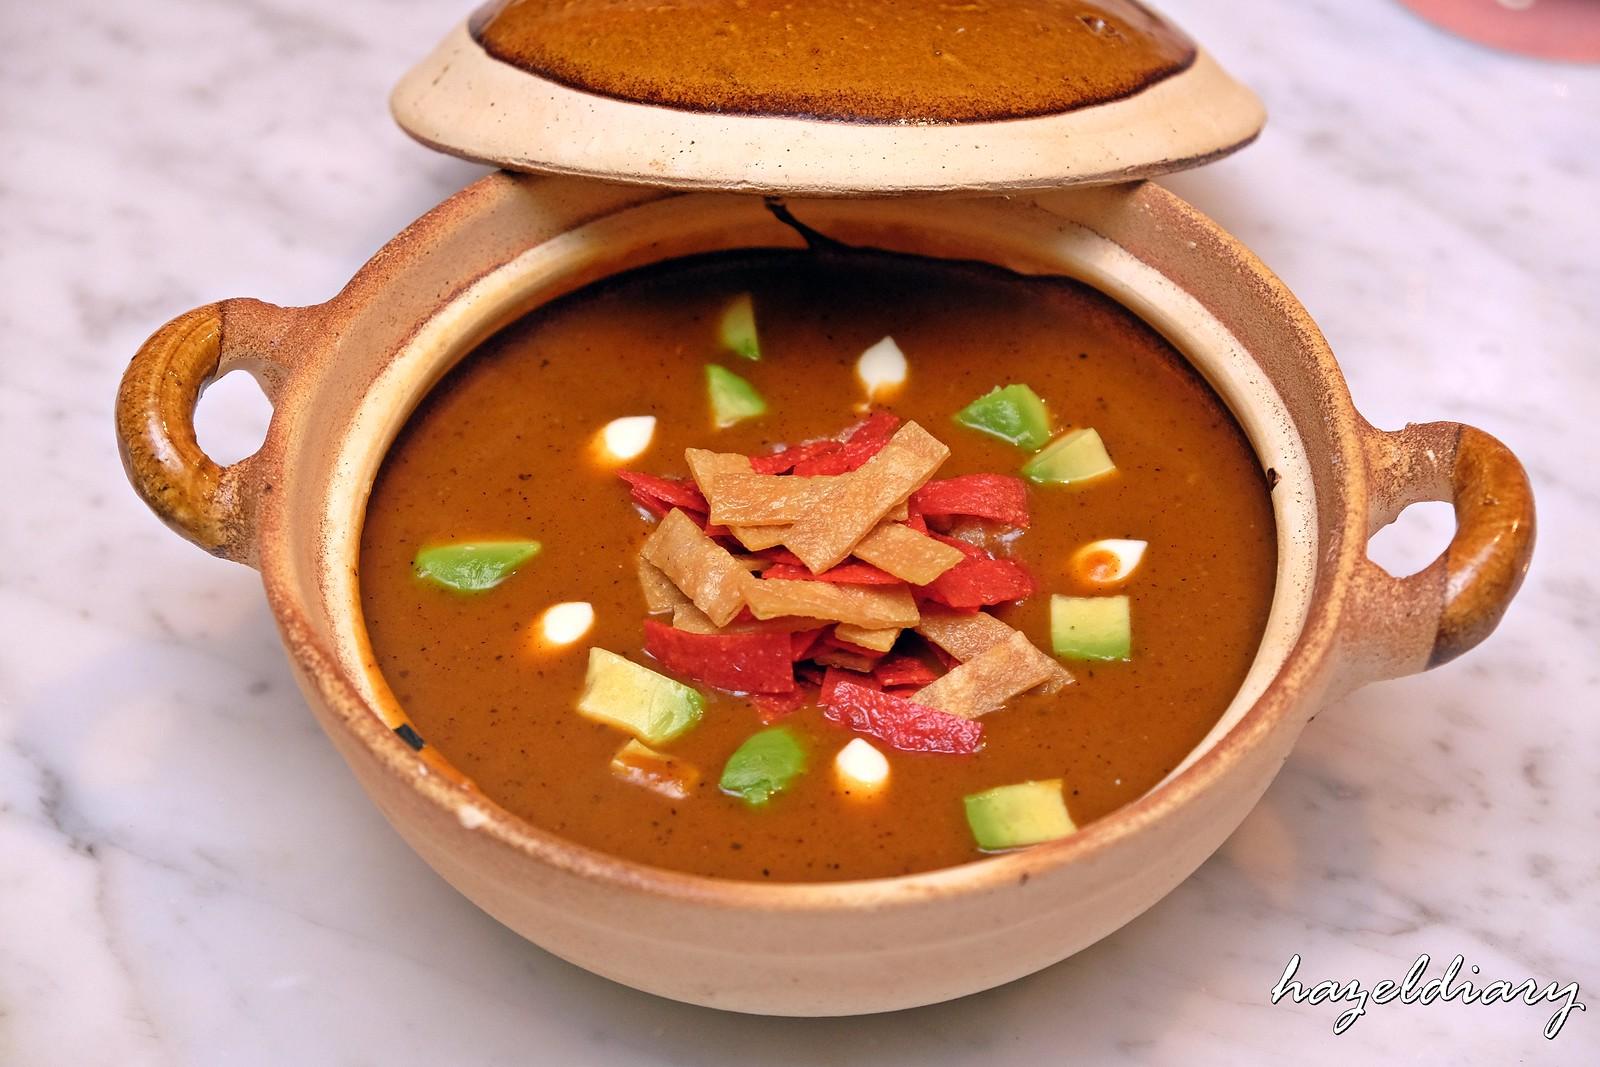 El Mero Mero Chijmes-Tortilla Soup